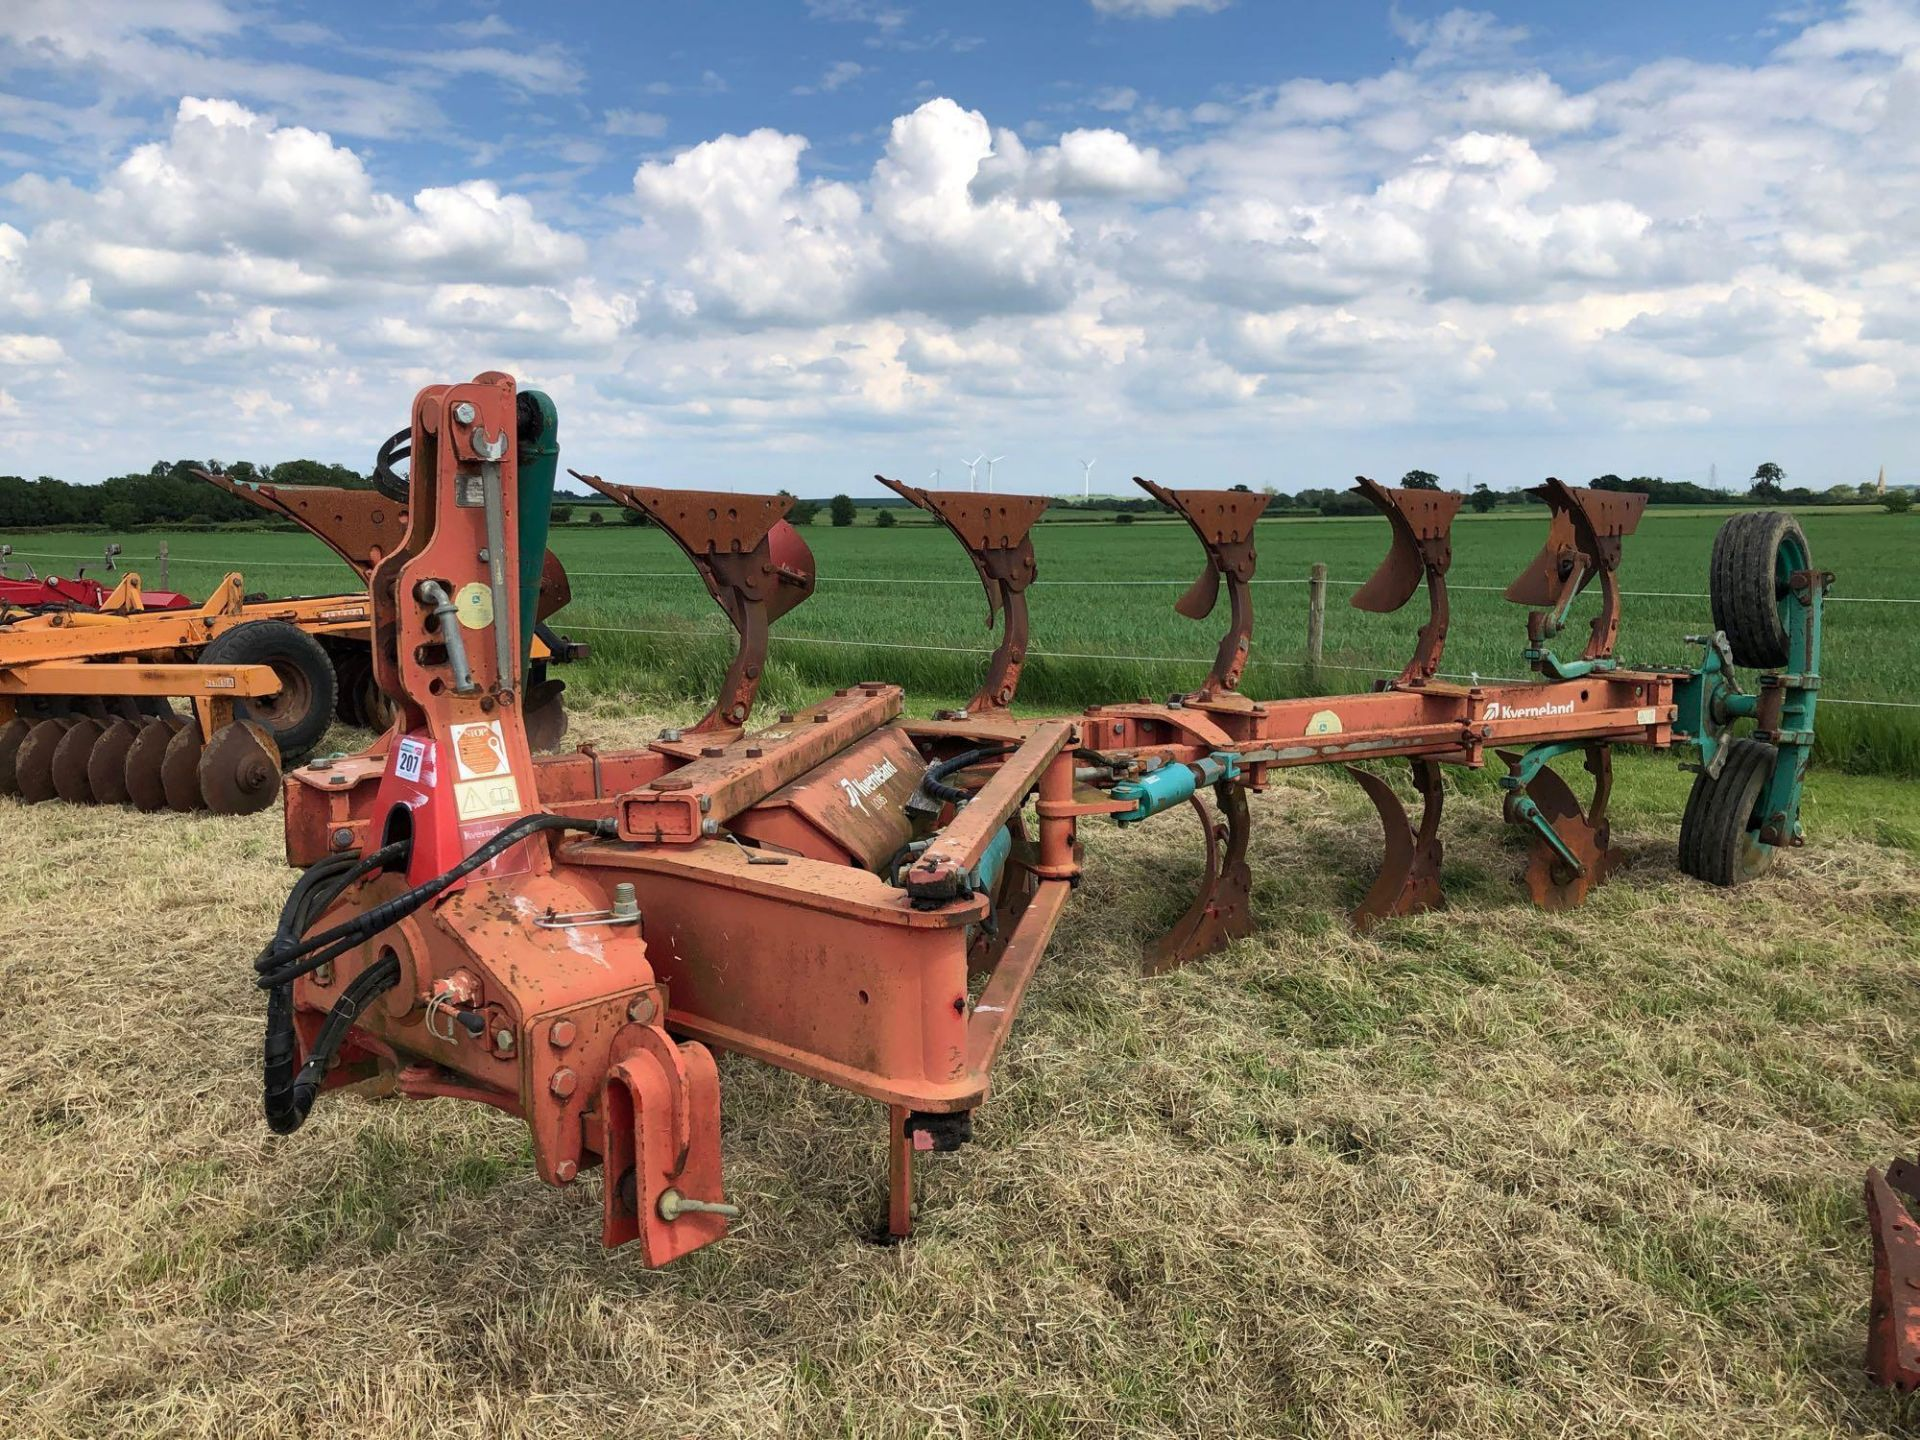 Kverneland 6+1f LO85 reversible plough, hydraulic vari-width. Model No: 85-300-28. Serial No: 240. N